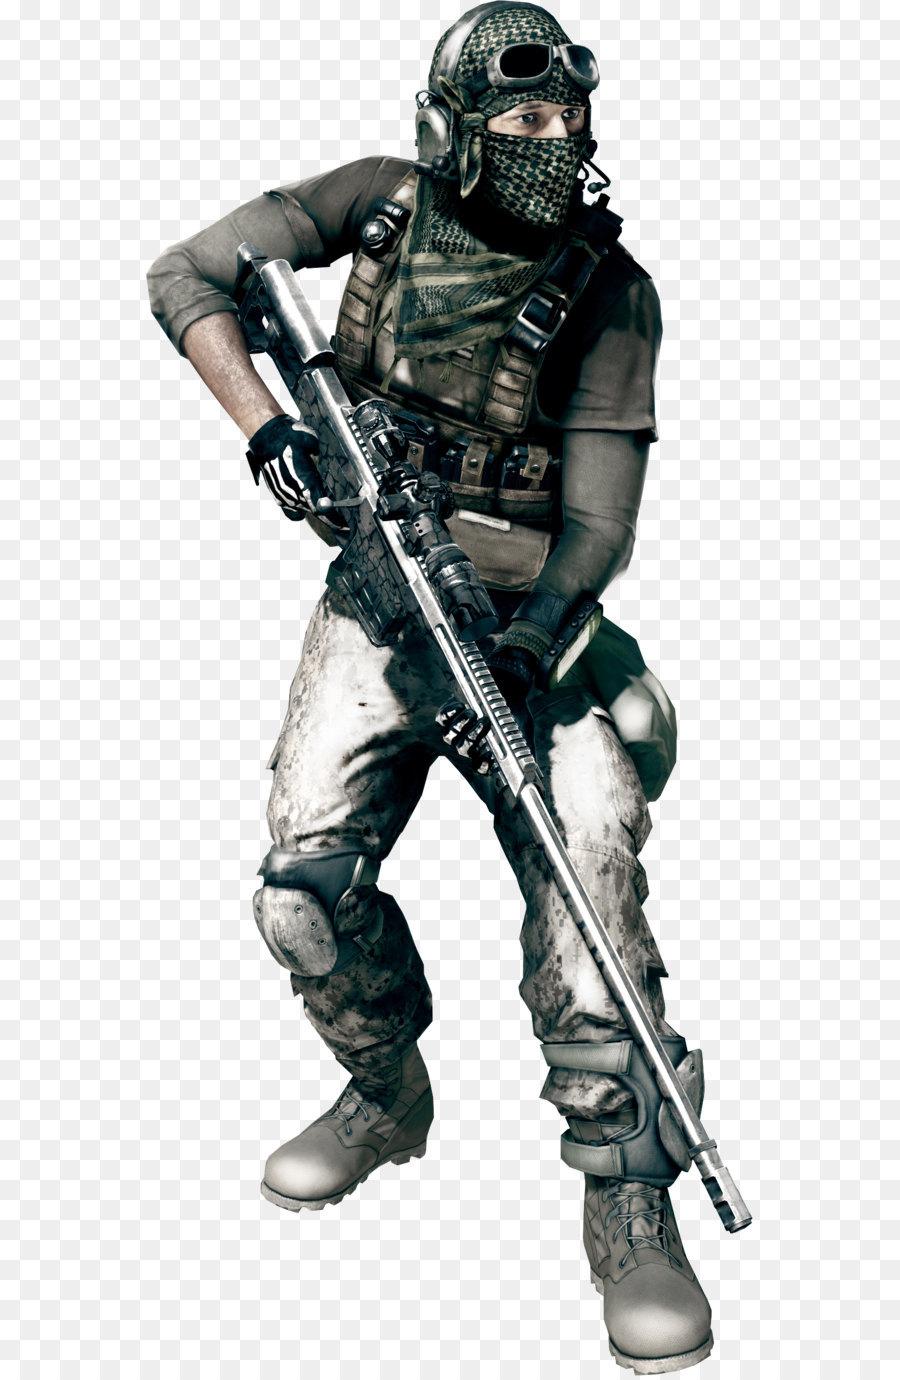 Battlefield 3 Soldier png download.